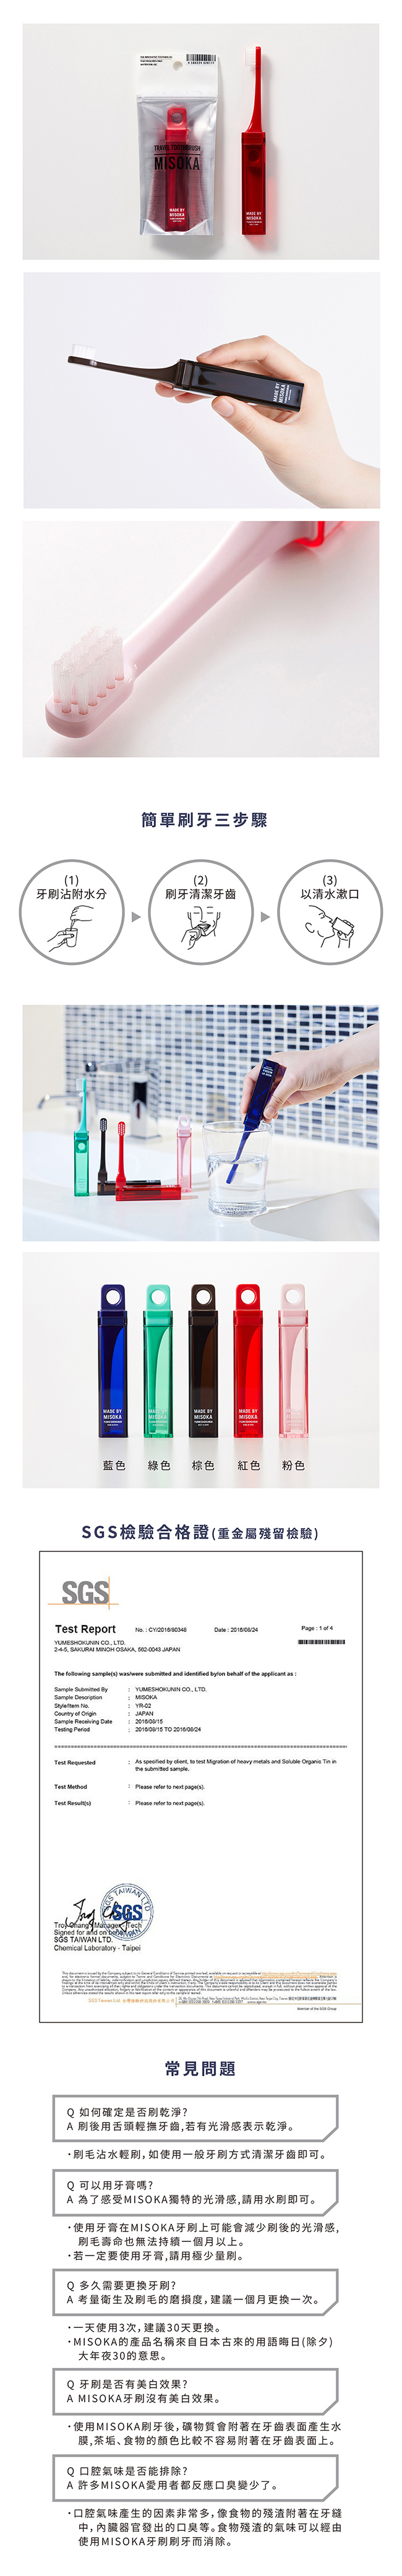 MISOKA │ 旅行款頂級免沾牙膏牙刷 (日本製 / 粉色)